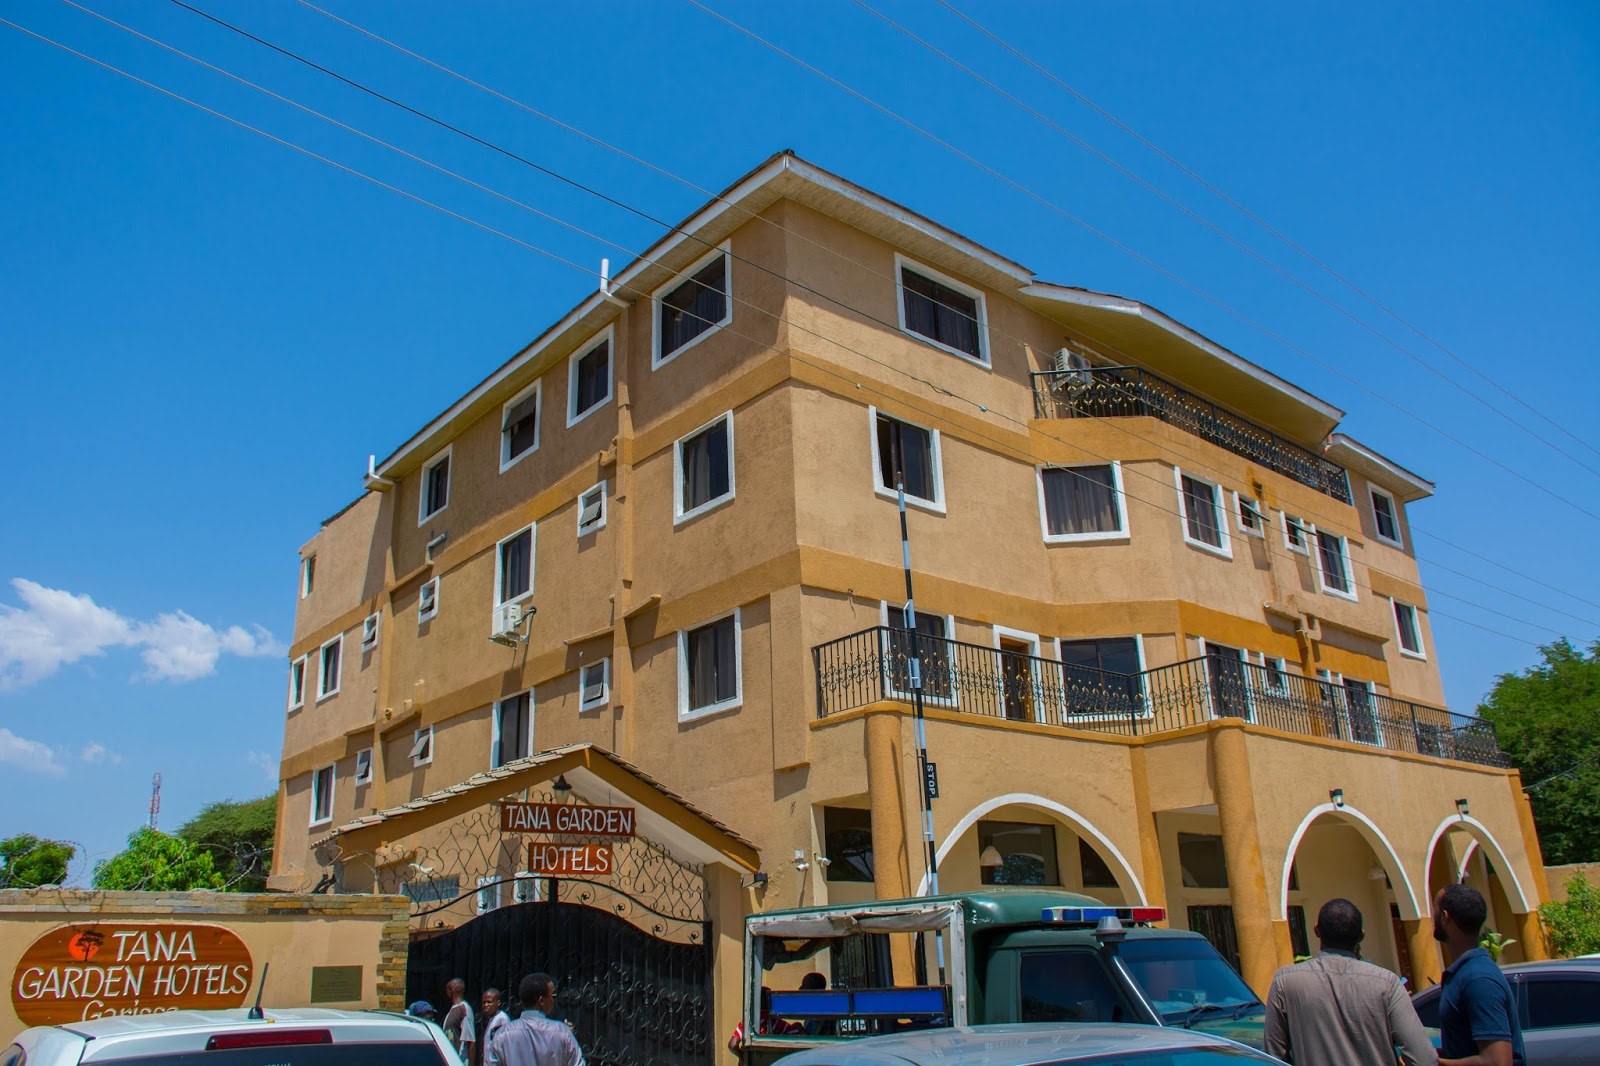 Aakphotography : Tana Garden Hotels New Hotel in Garissa County a ...